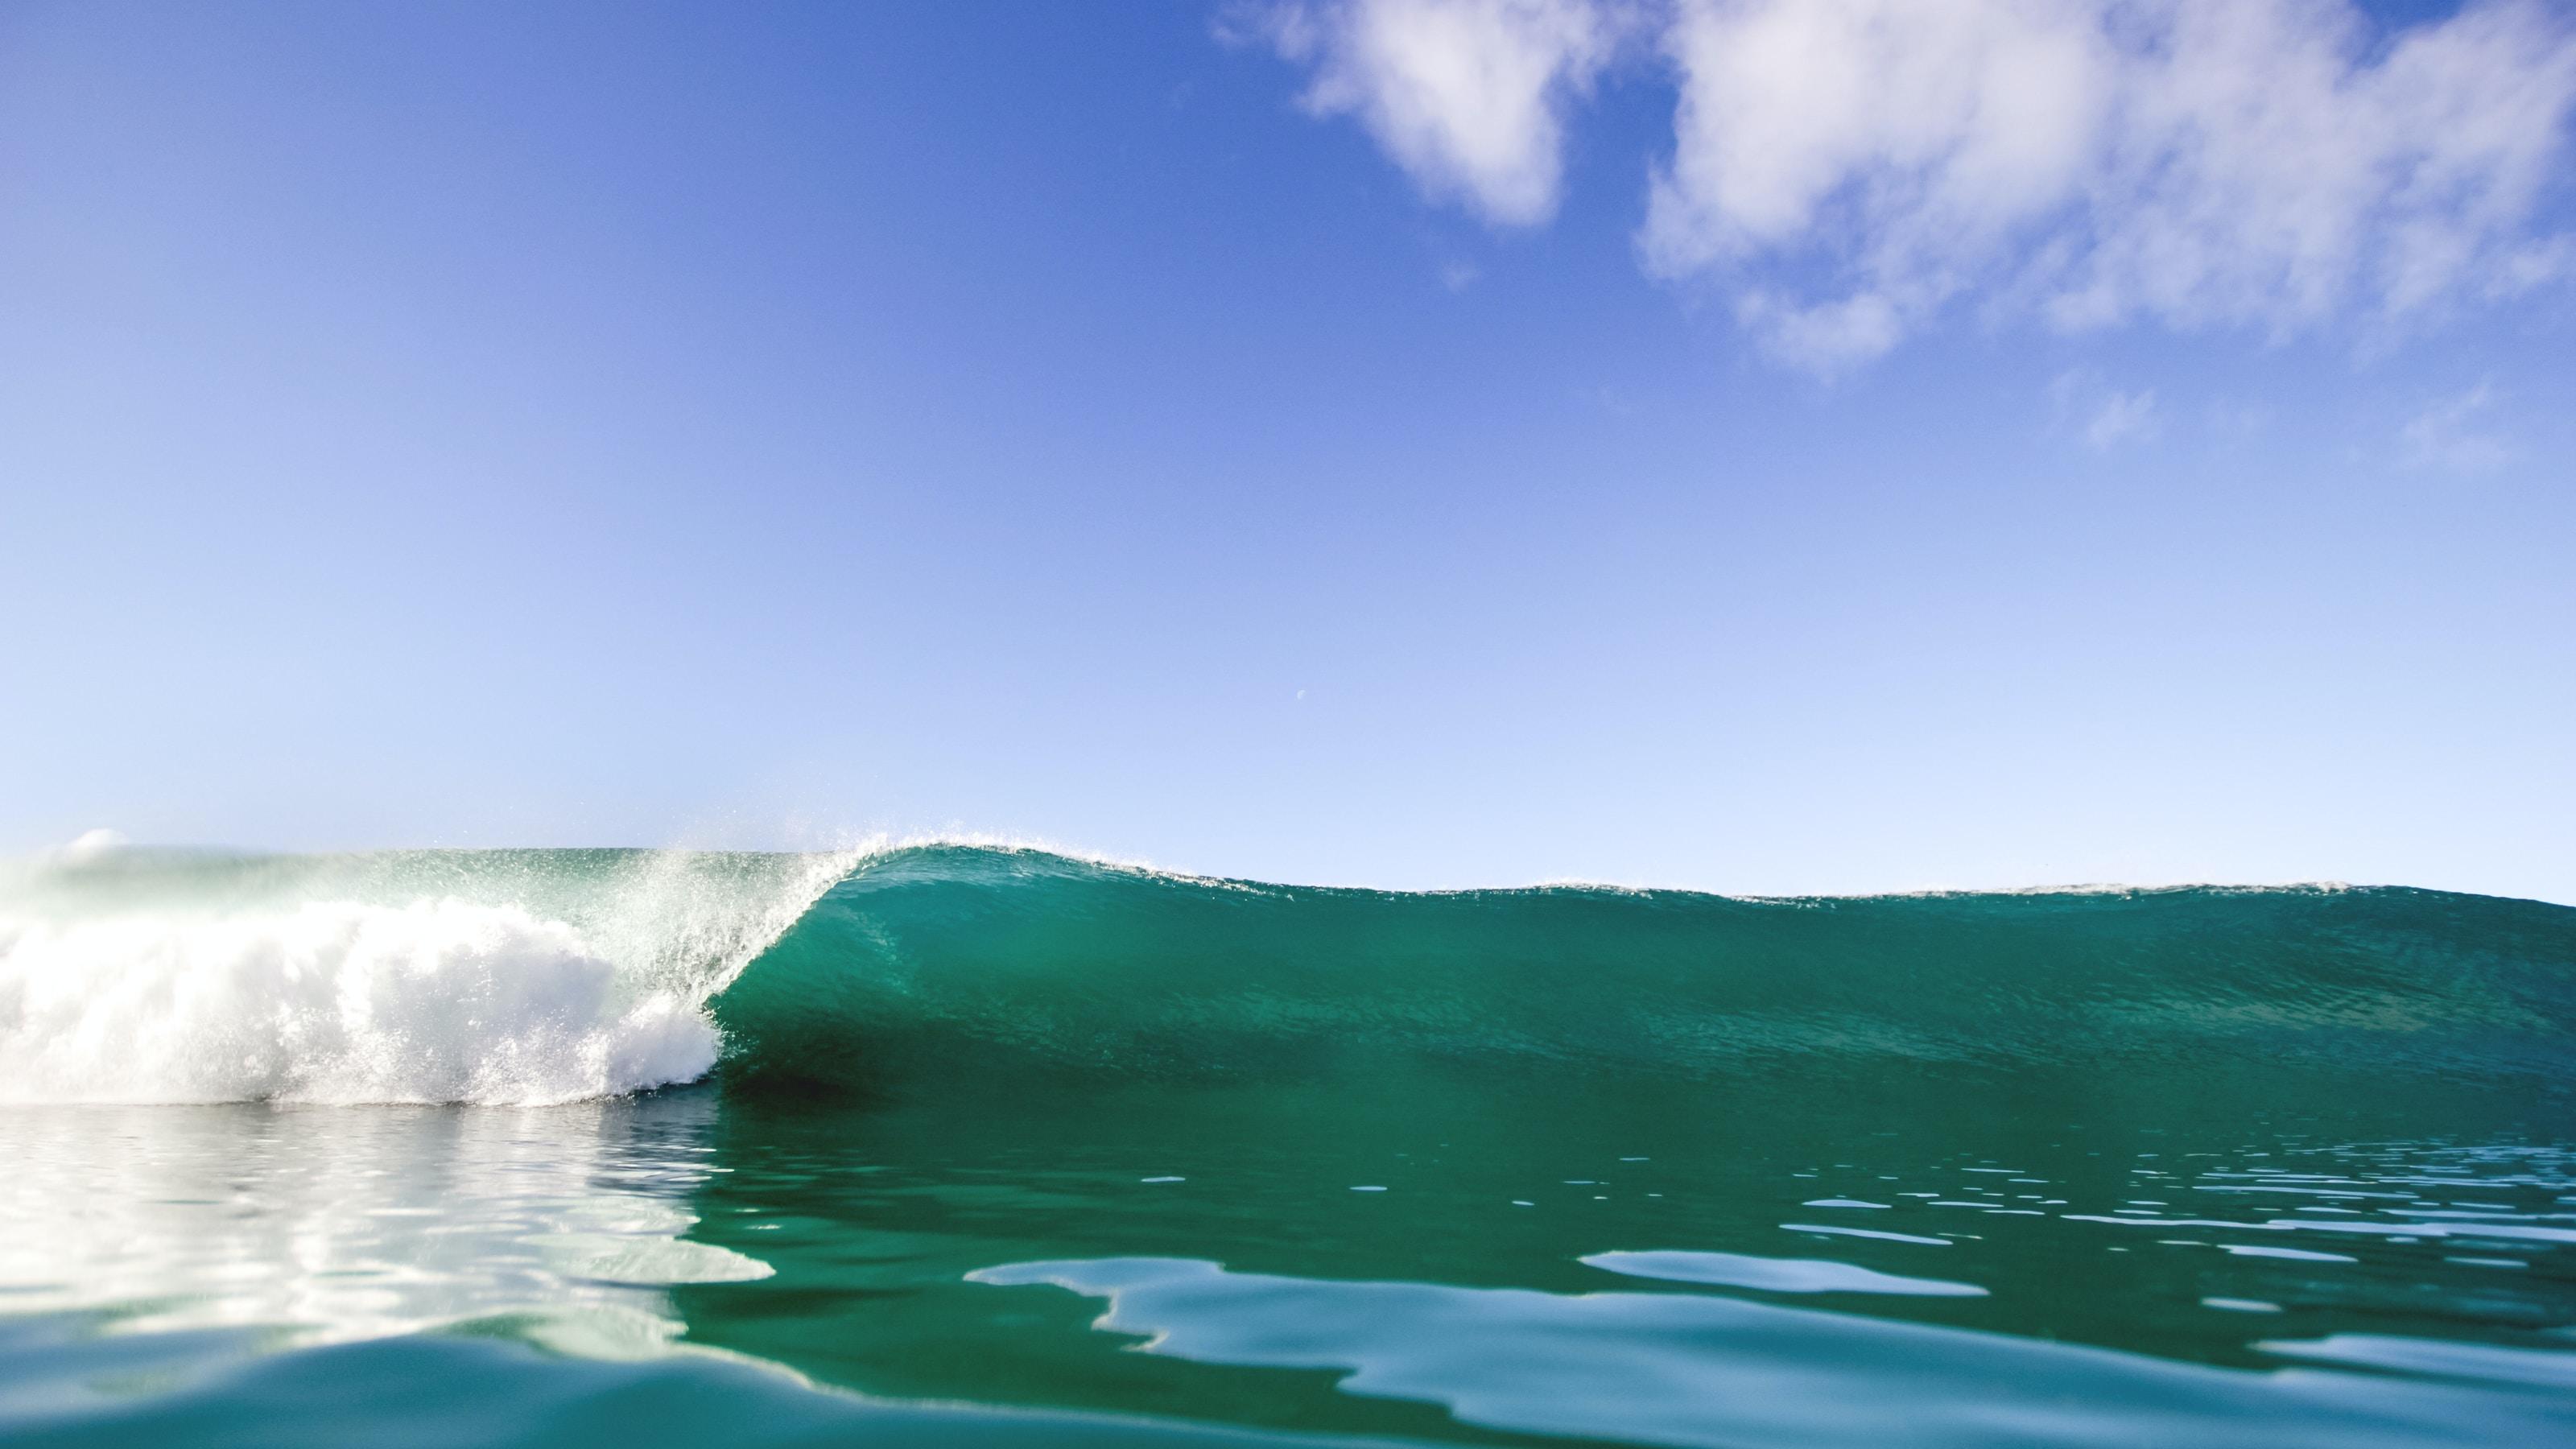 Big ocean surf wave at Torrey Pines State Beach